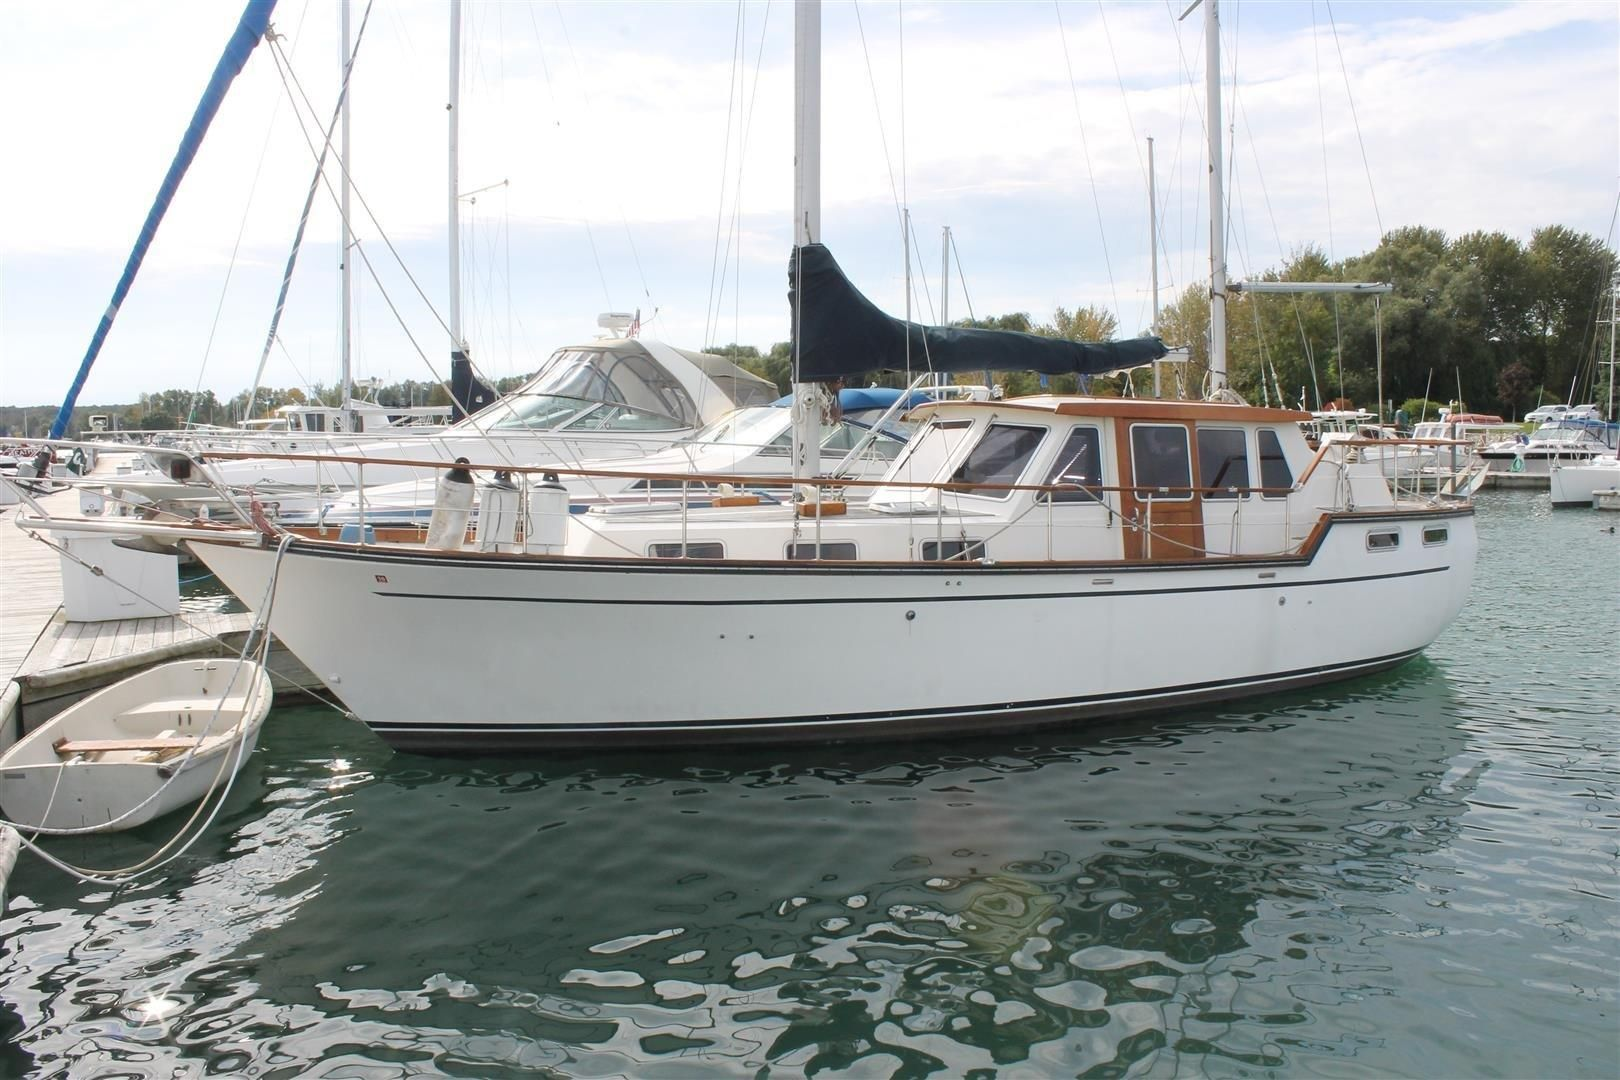 1986 Nauticat 36 Sail Boat For Sale Www Yachtworld Com